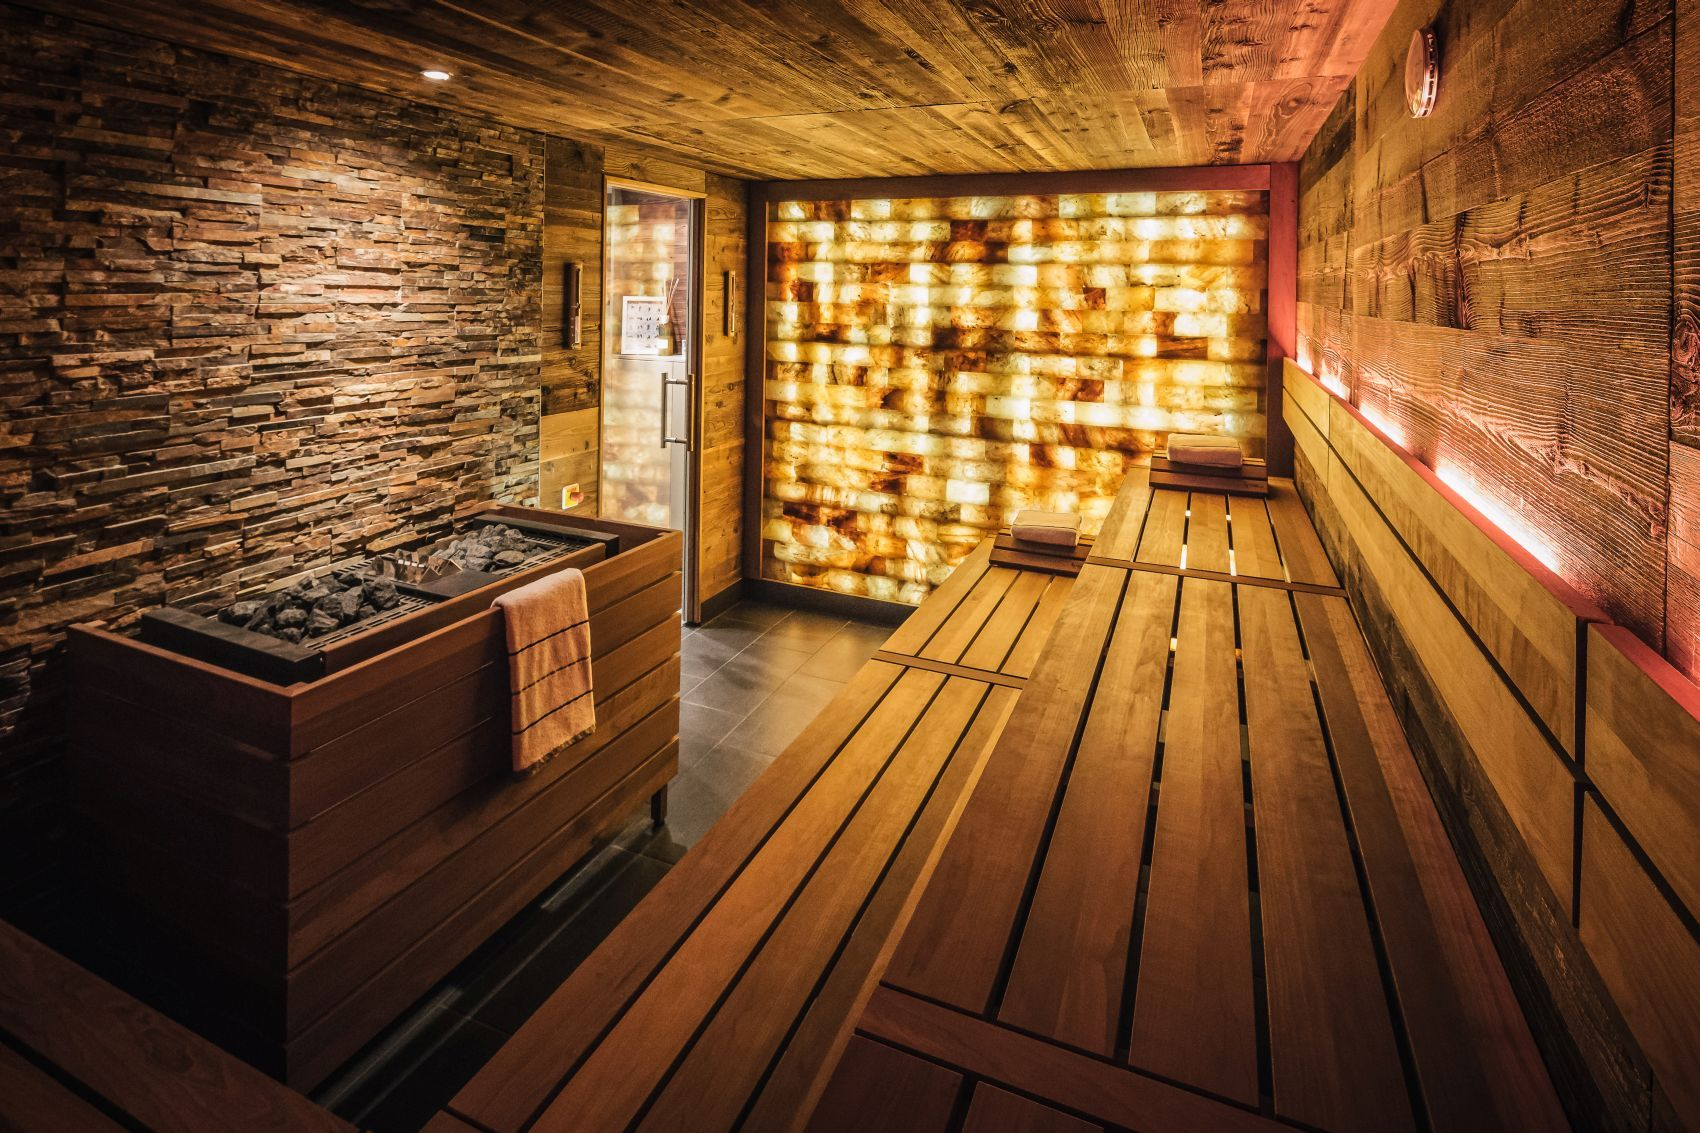 Schlichtes Sauna Design Holz Seeblick – usblife.info